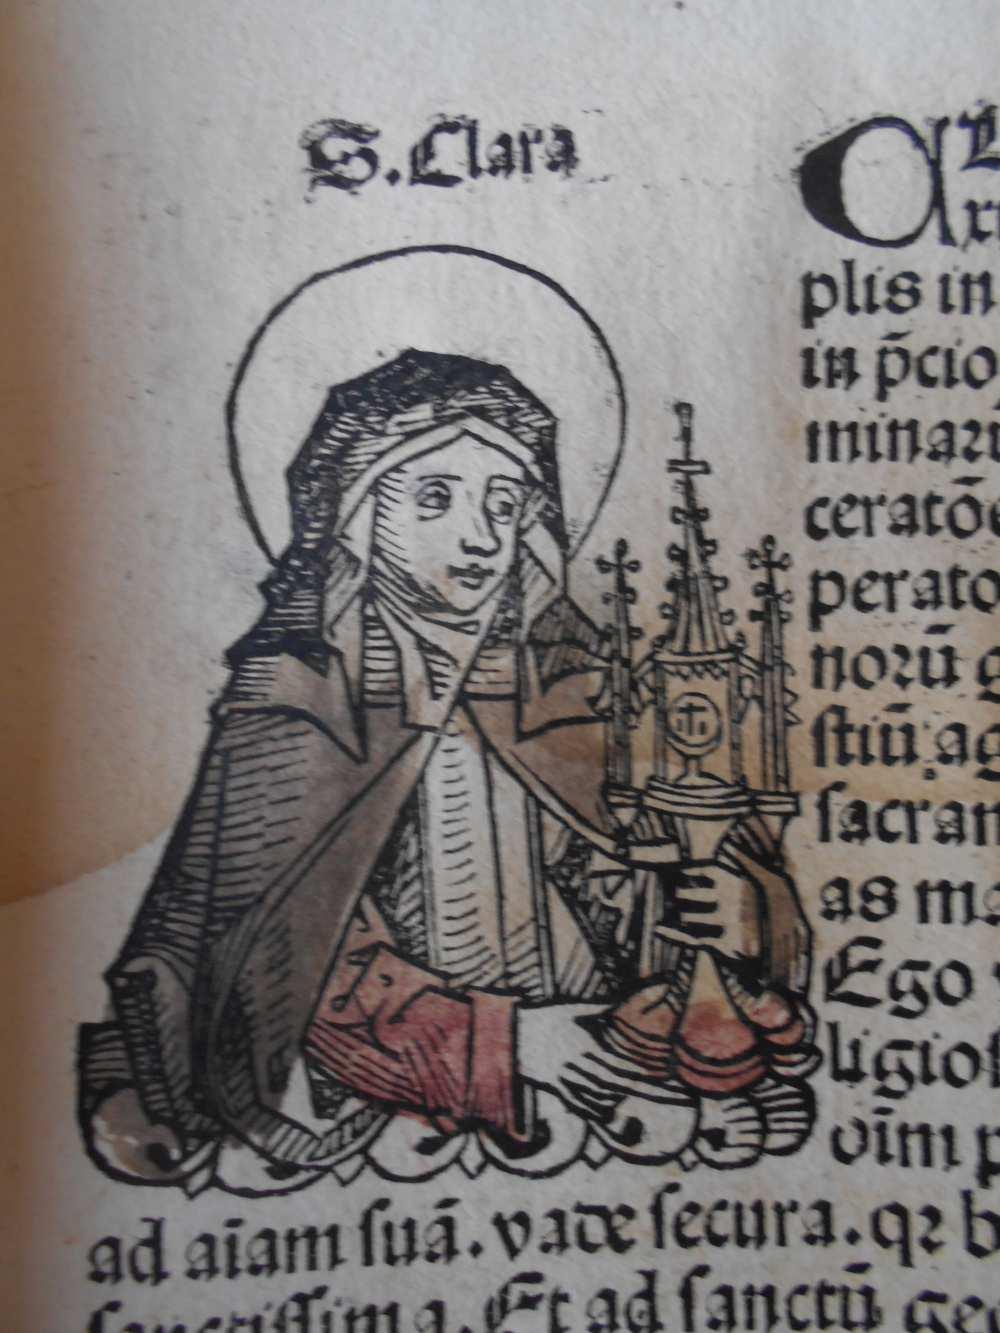 schedel_liber_chronicarum_210a_klara_opti.jpg